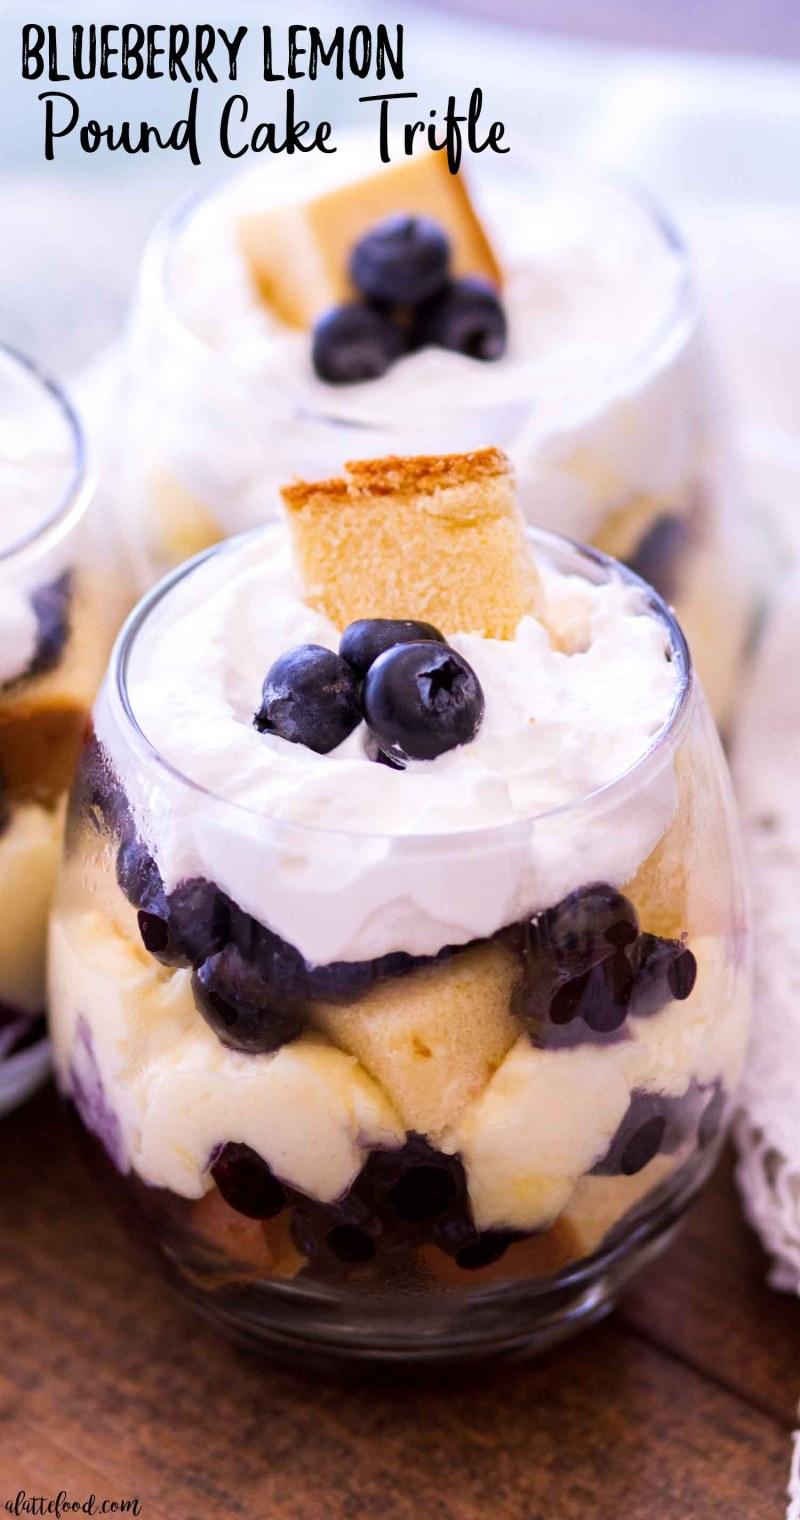 up close photo of blueberry lemon pound cake trifle with text on photo